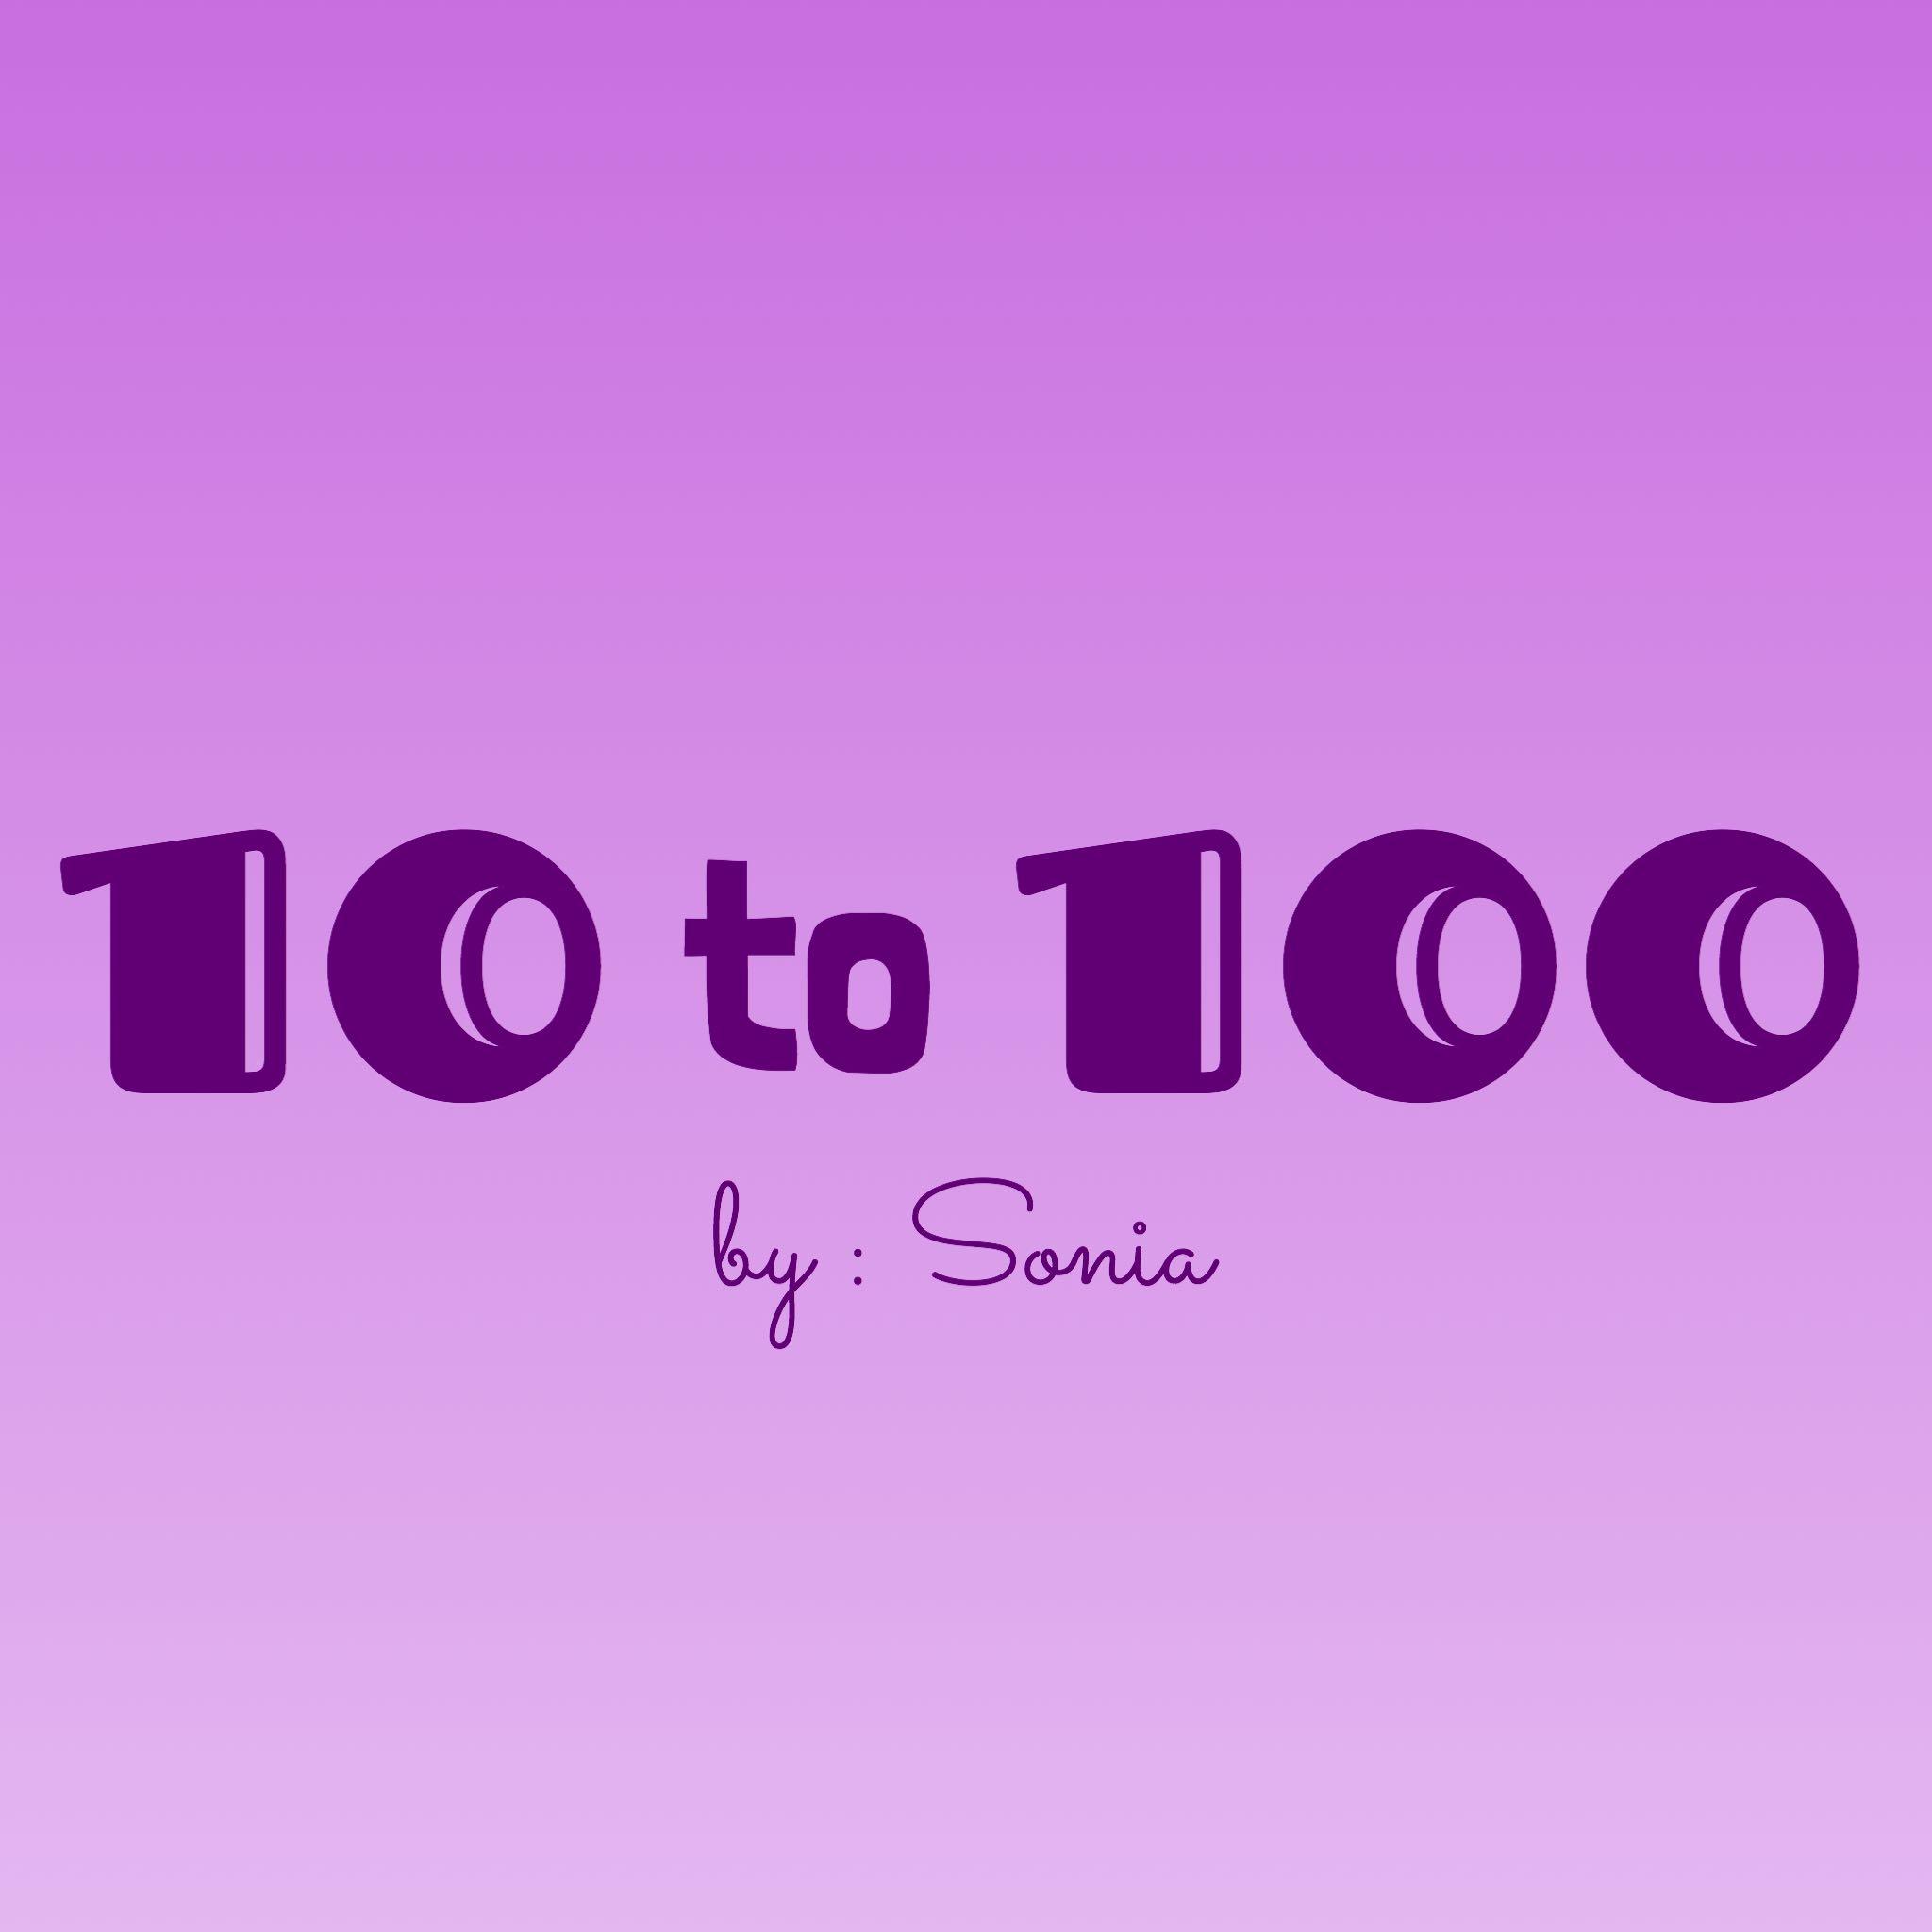 10to100